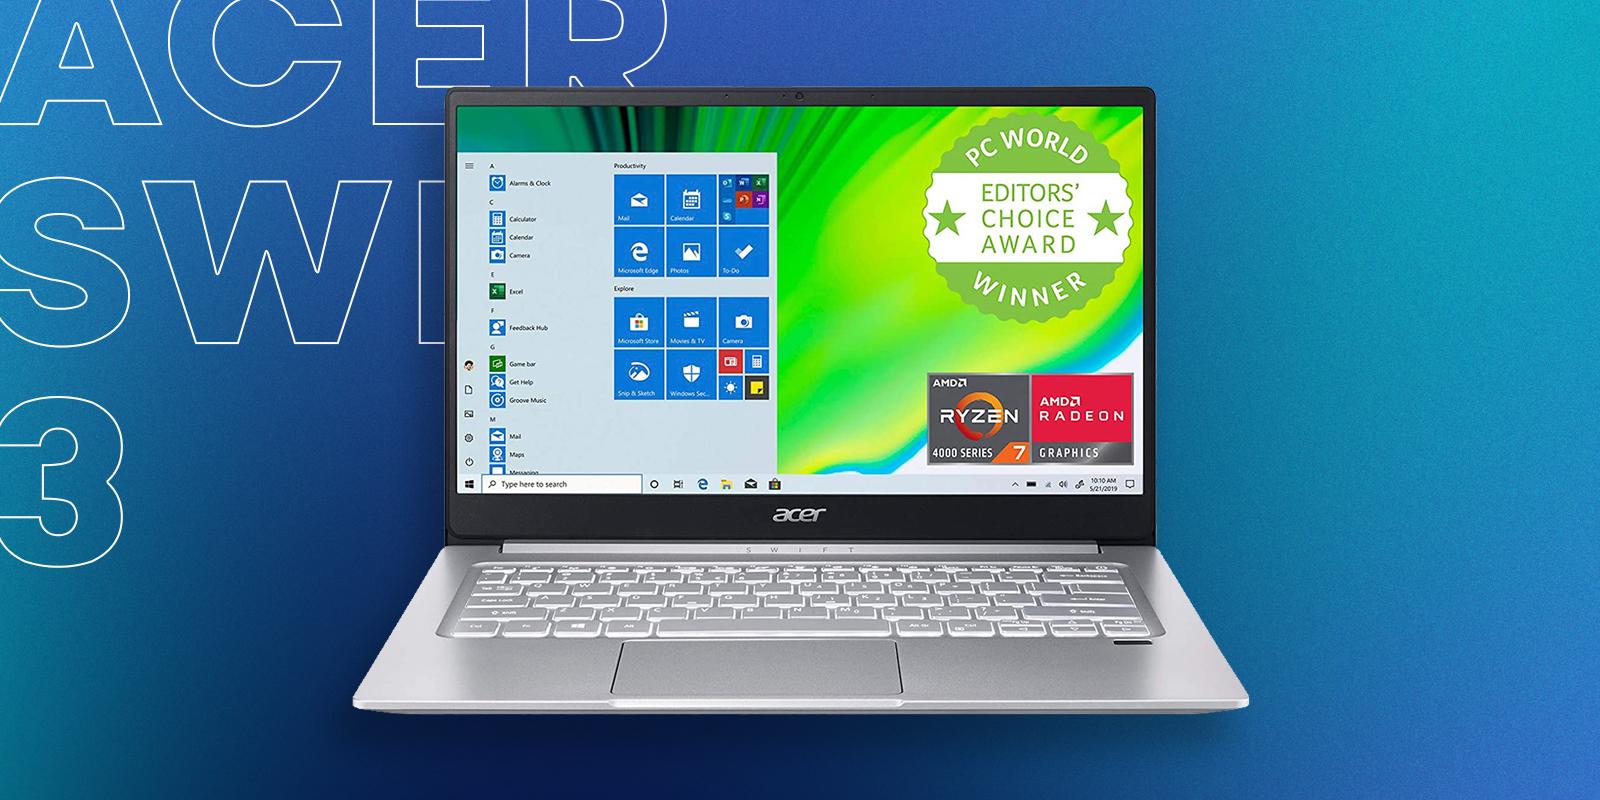 Acer Swift 3 AMD Ryzen Best Budget Laptop For Graphic Design